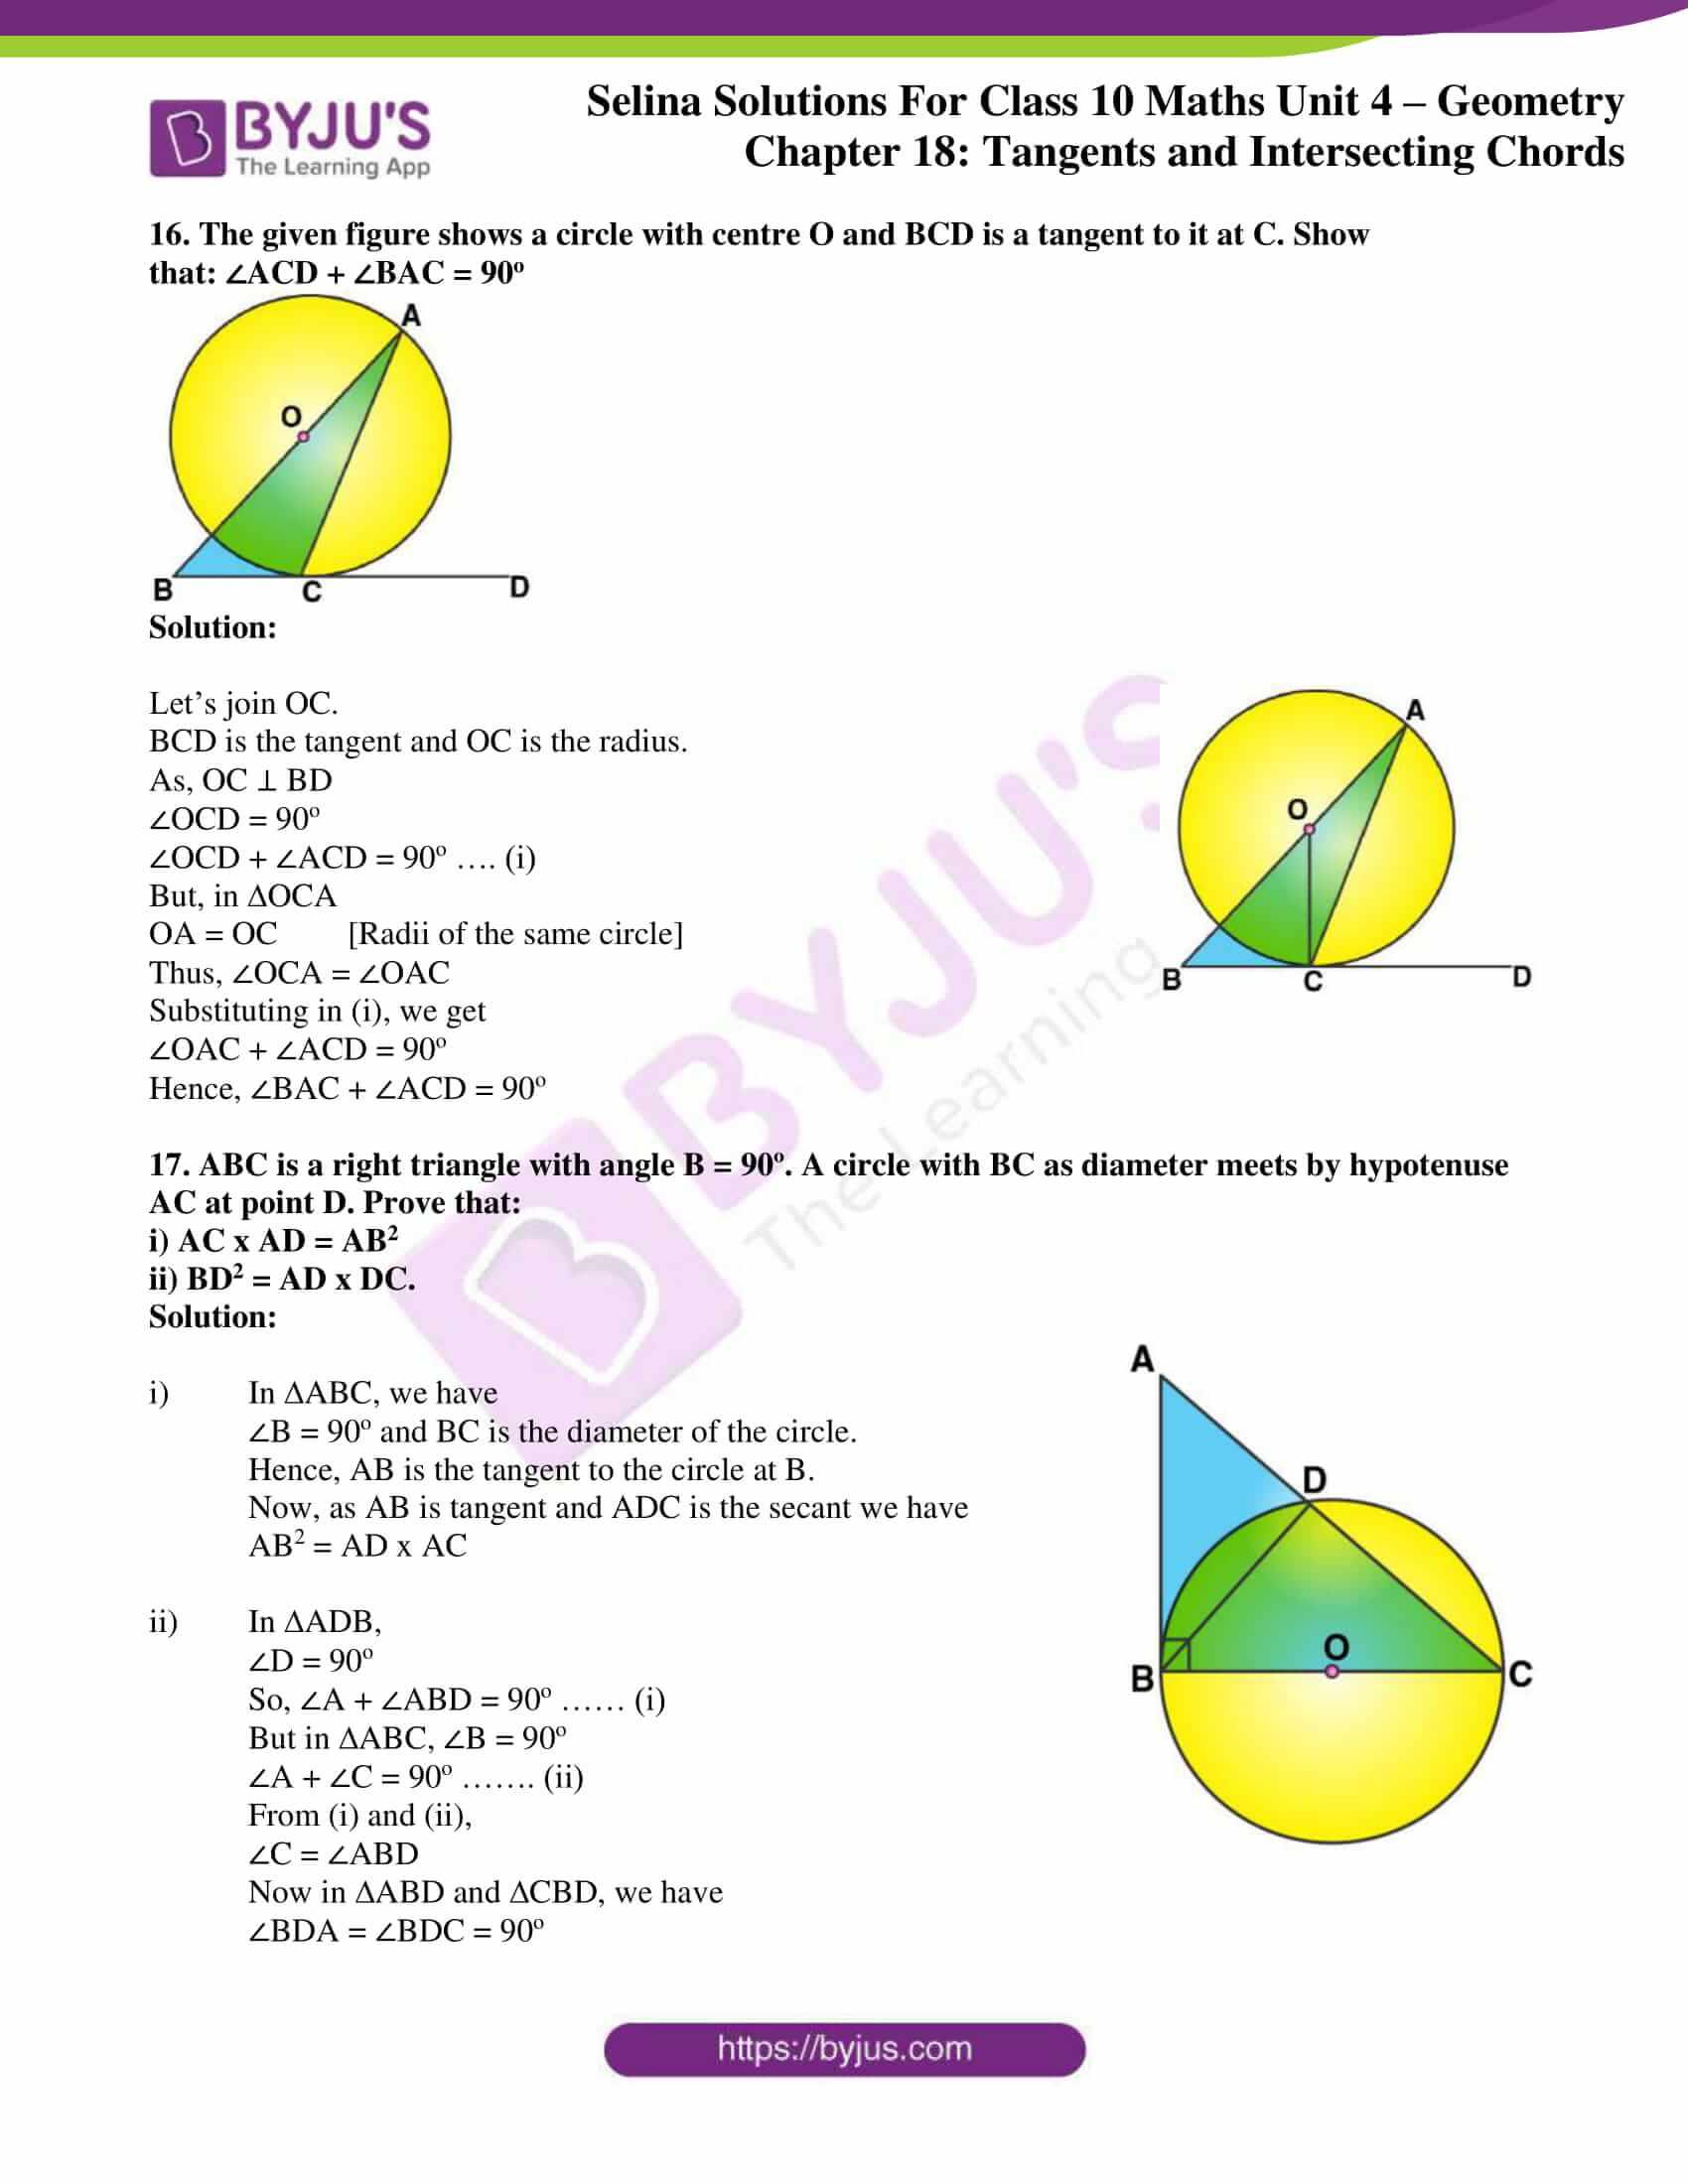 selina-sol-maths-class-10-ch-18-ex-c-09